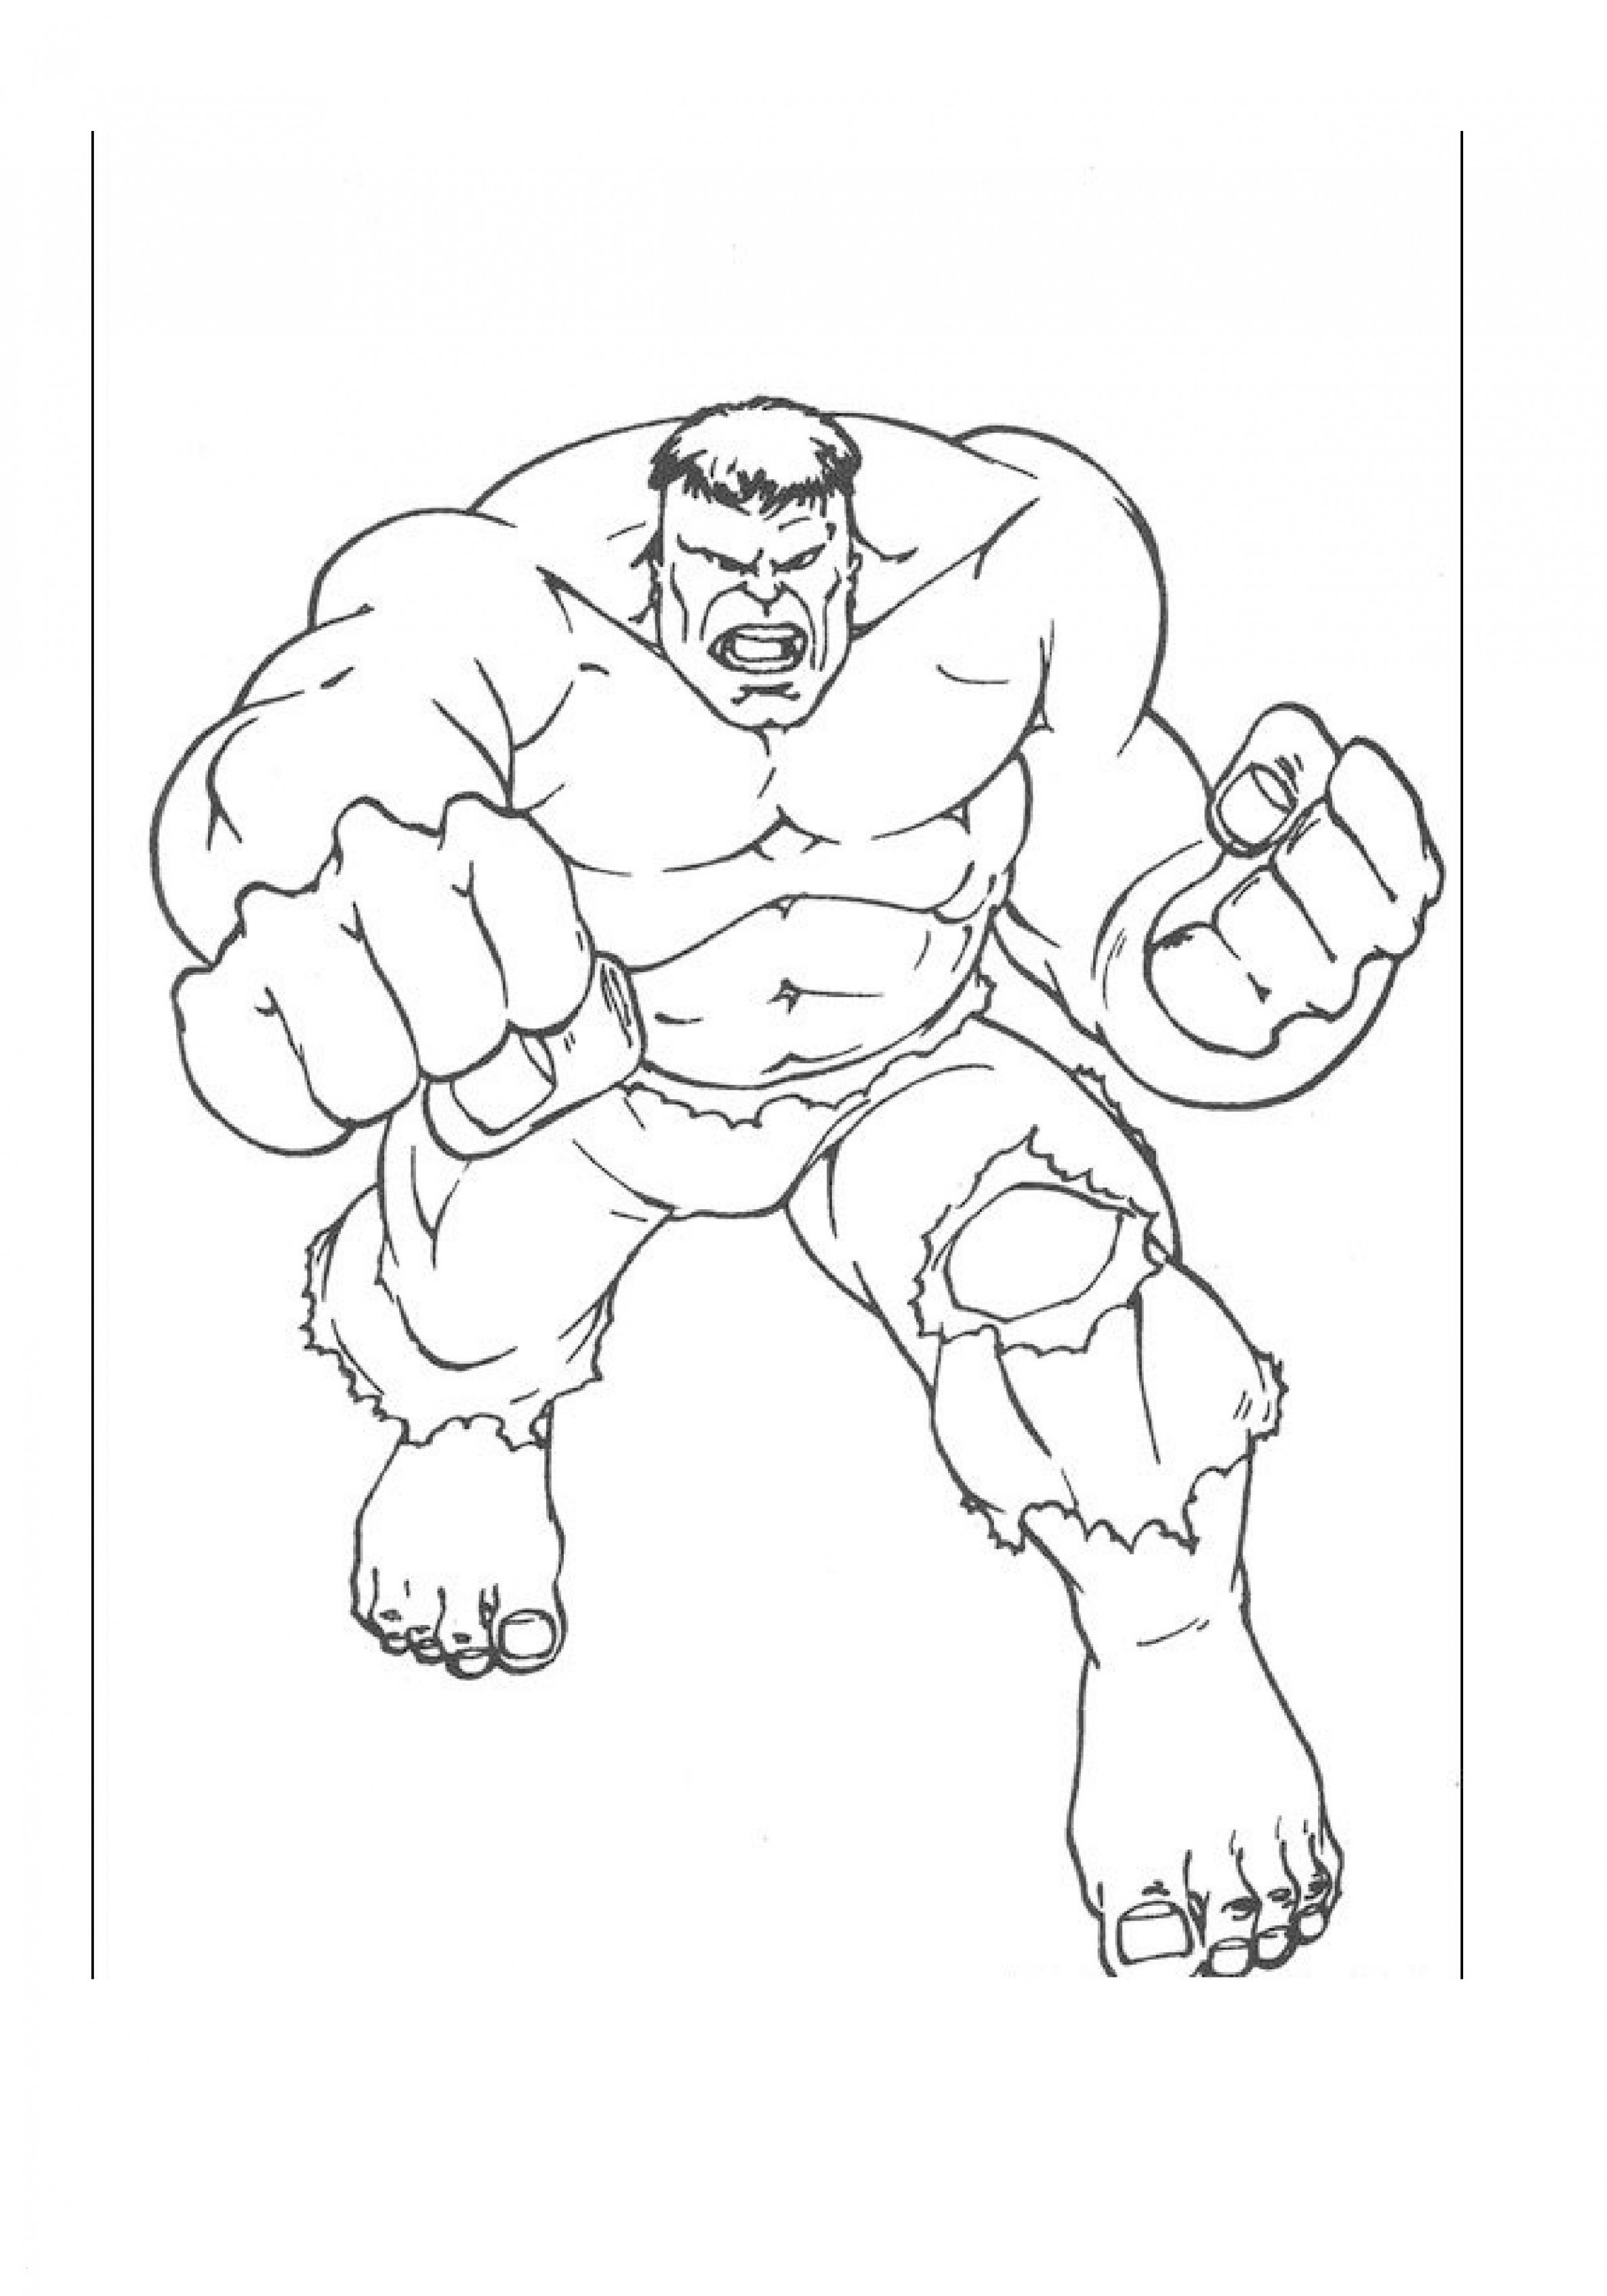 Ausmalbilder Ironman Neu Iron Man Coloring Pages Bild